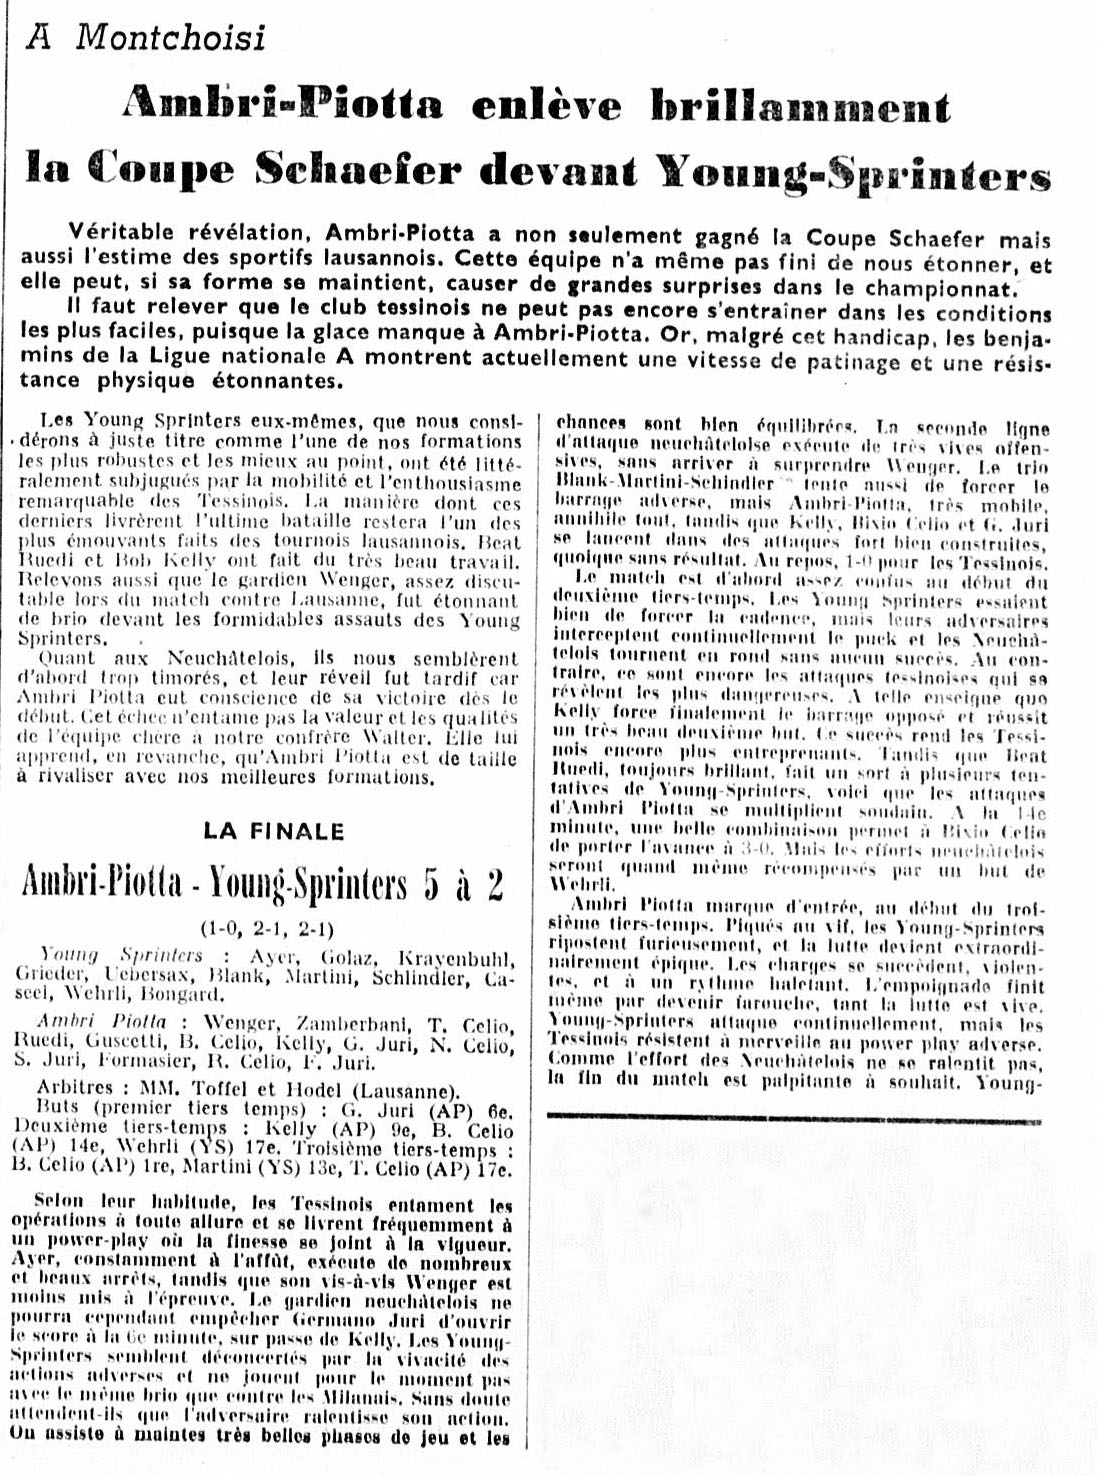 Le Matin - Tribune de Lausanne_19531214_aeun3j-1.jpg